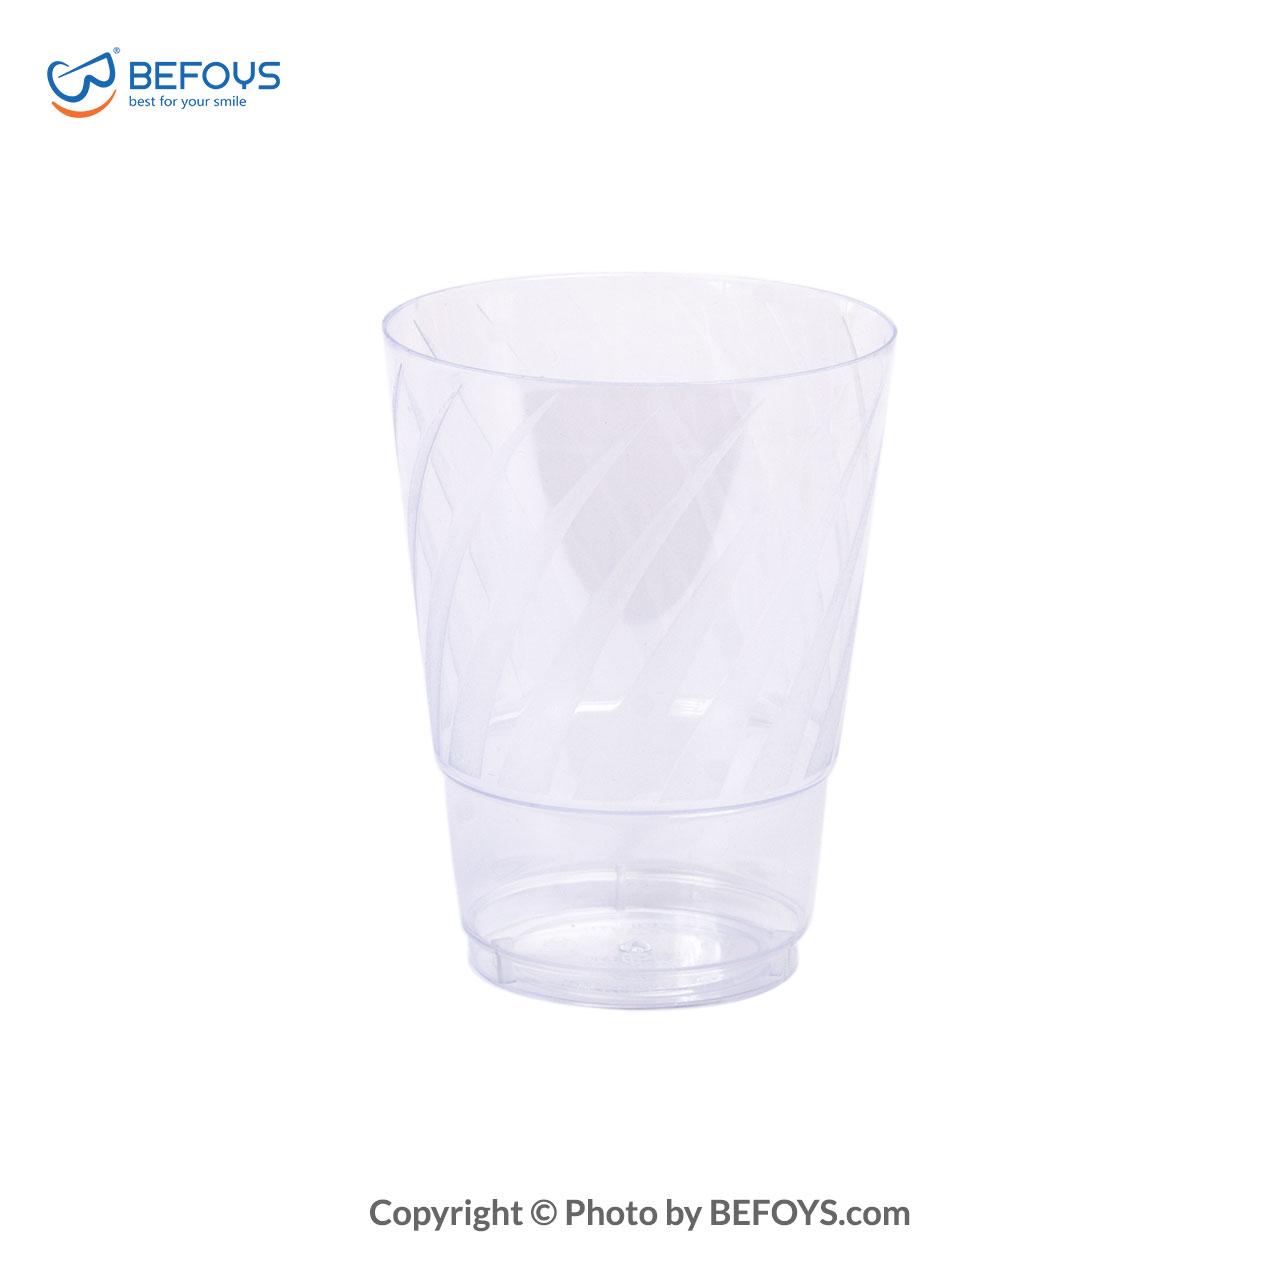 لیوان یکبار مصرف بسته ای اسپشال کوشا 25 عددی